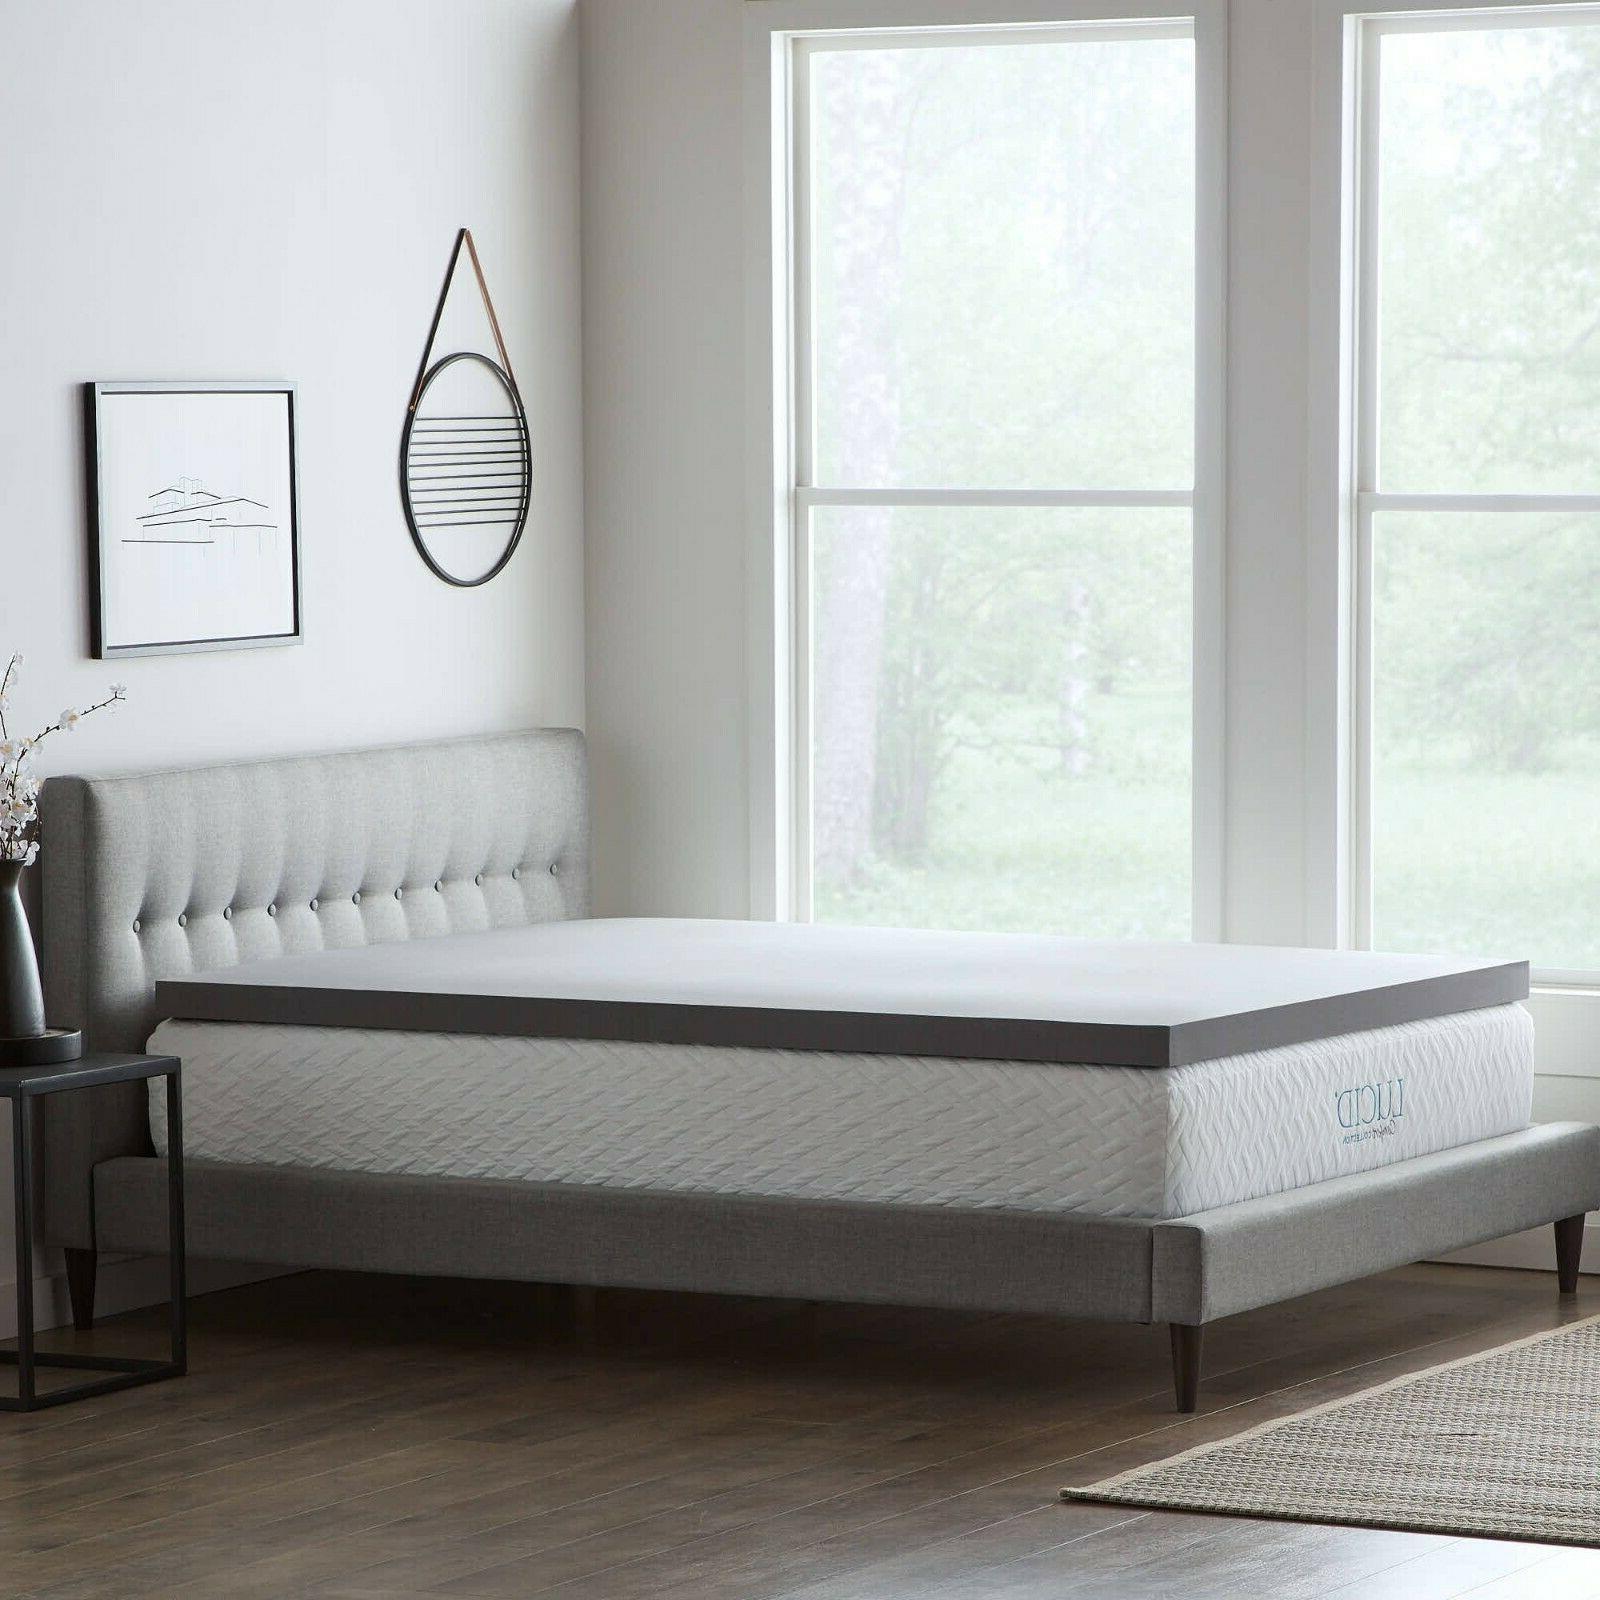 bamboo charcoal memory foam mattress topper